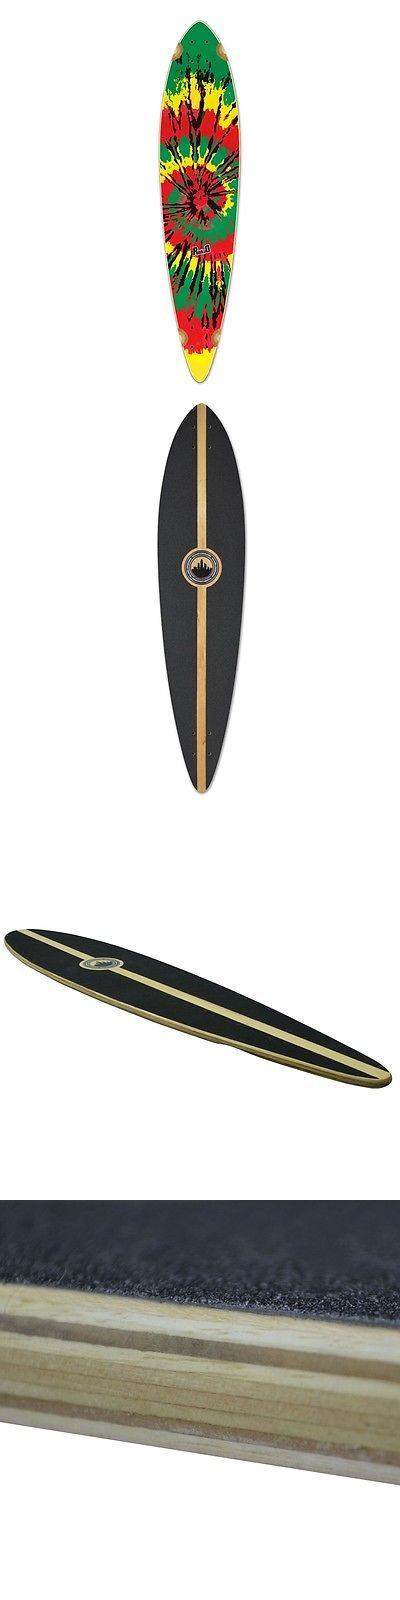 Decks 165944: Yocaher Punked Pintail Tie Dye Rasta Longboard Deck -> BUY IT NOW ONLY: $52.99 on eBay!